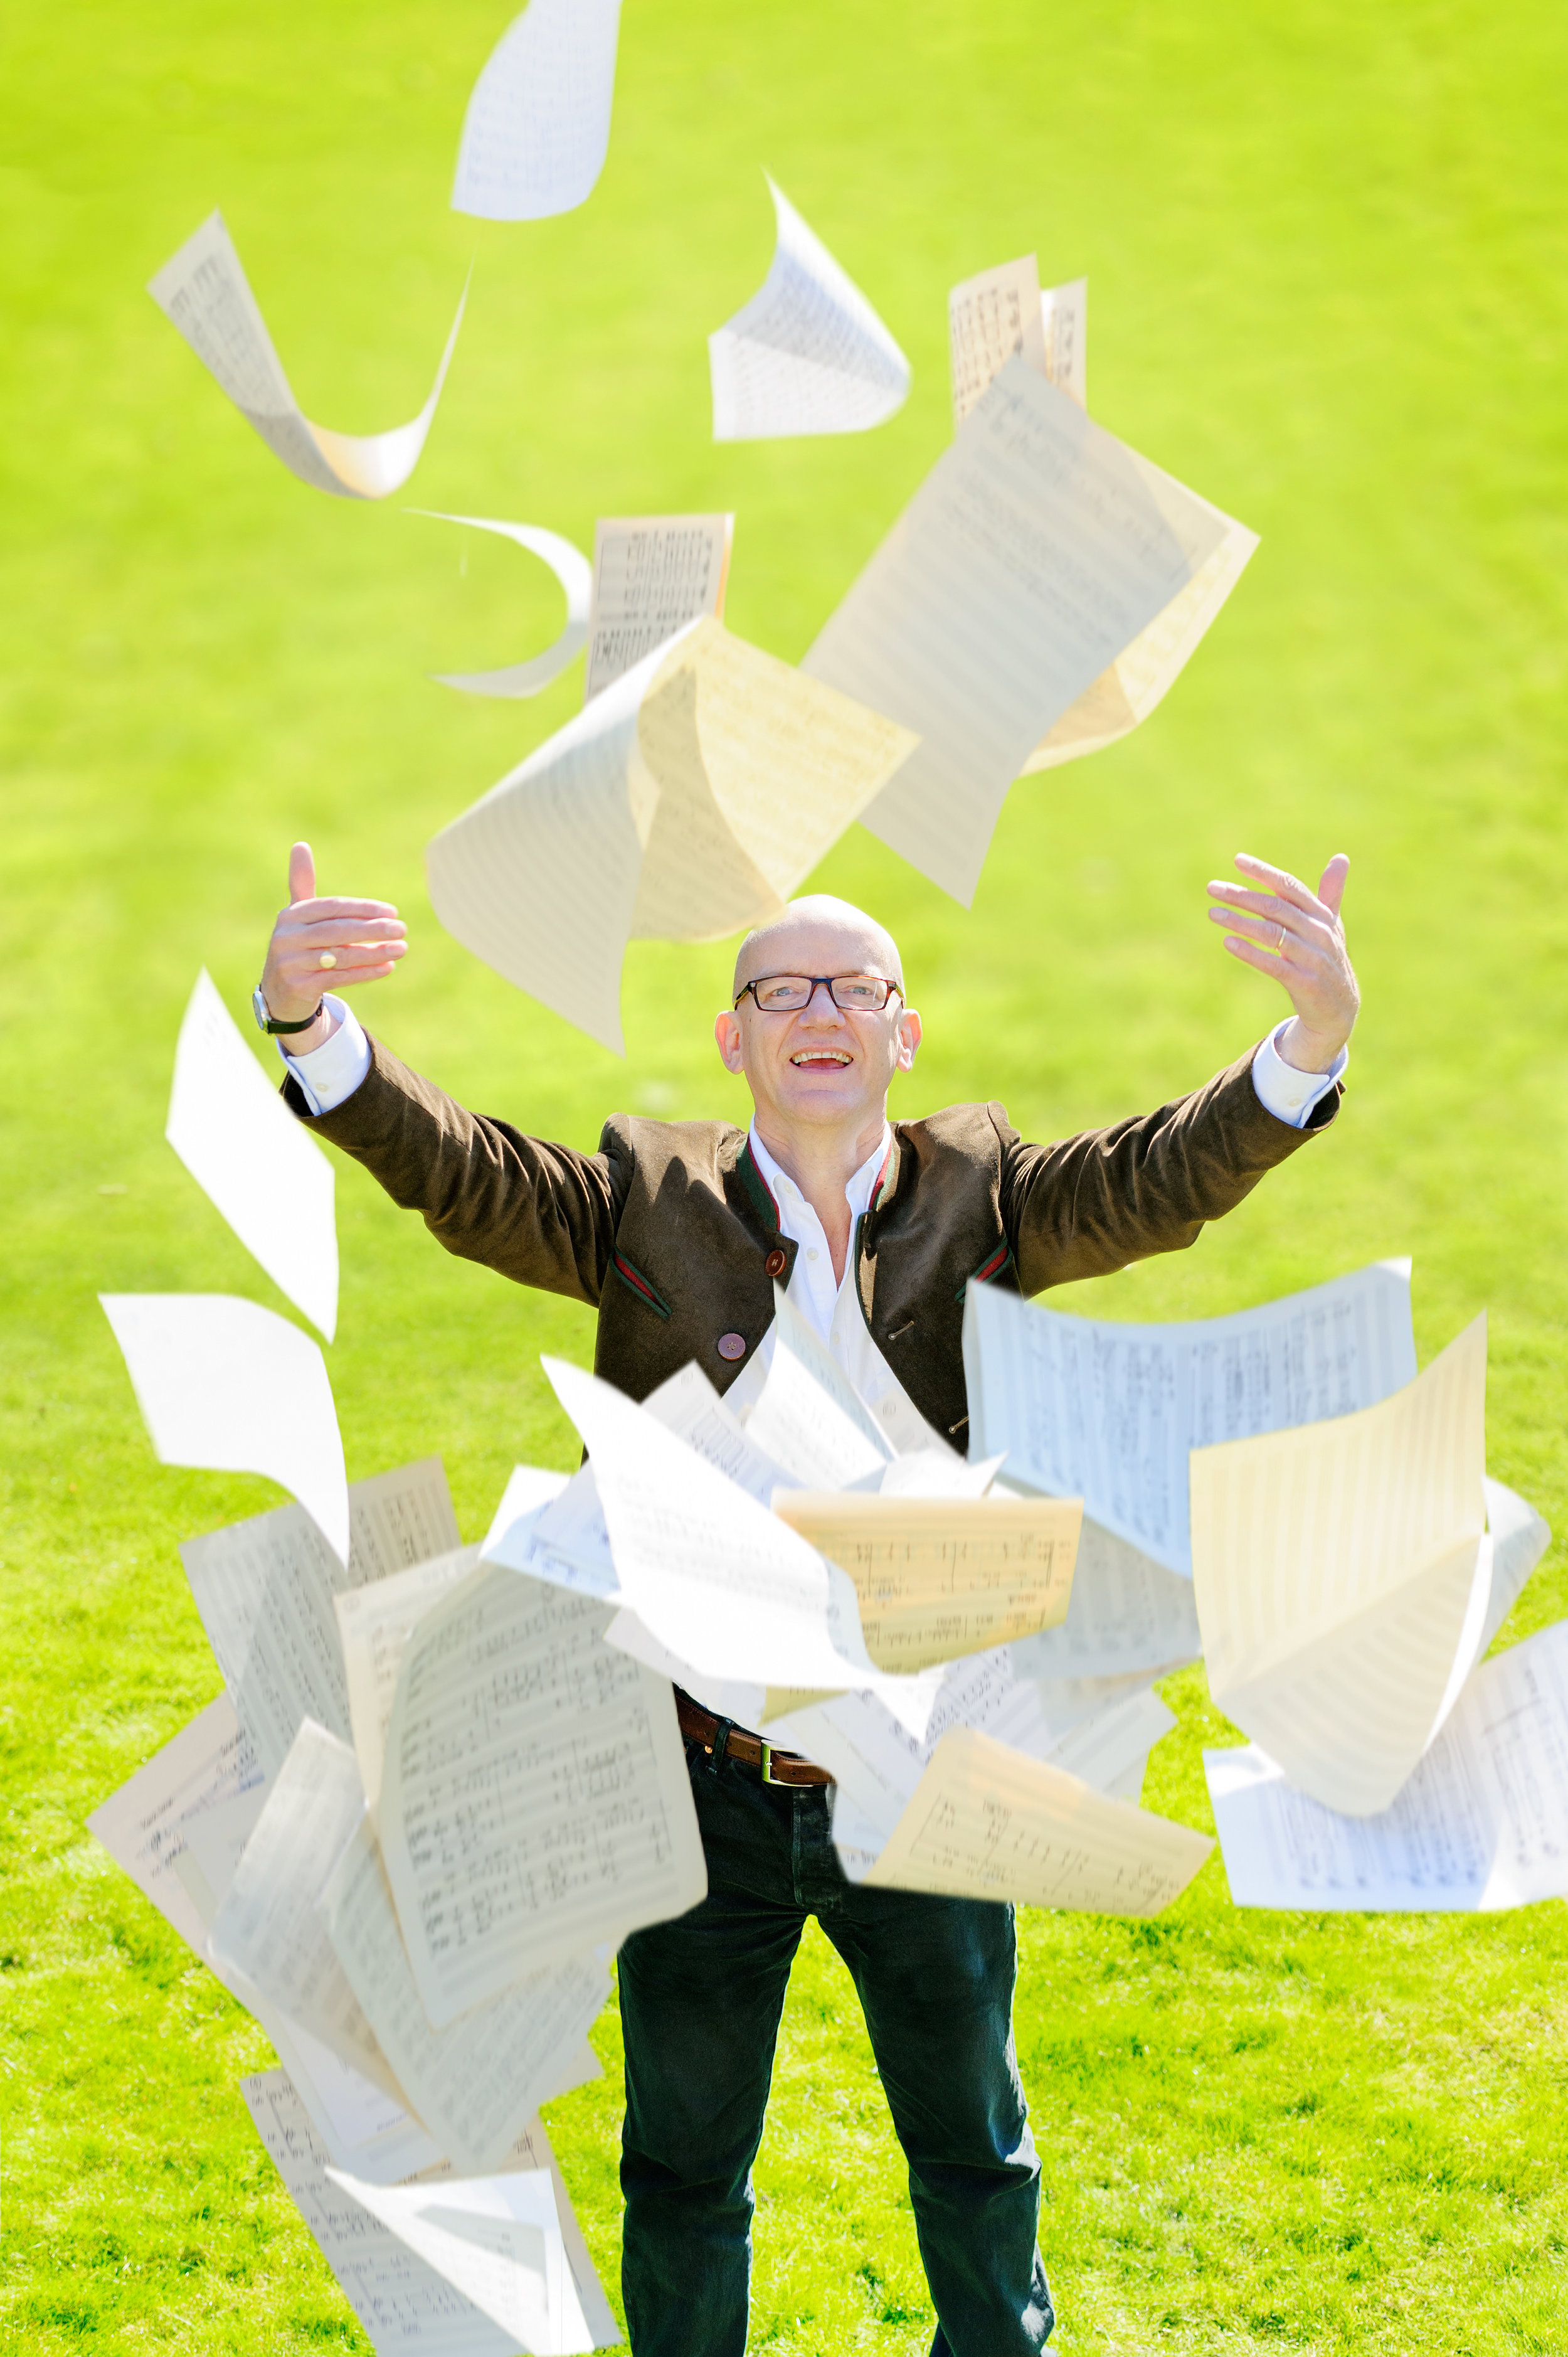 BobChilcott with Papers by John Bellars 4256px.jpg